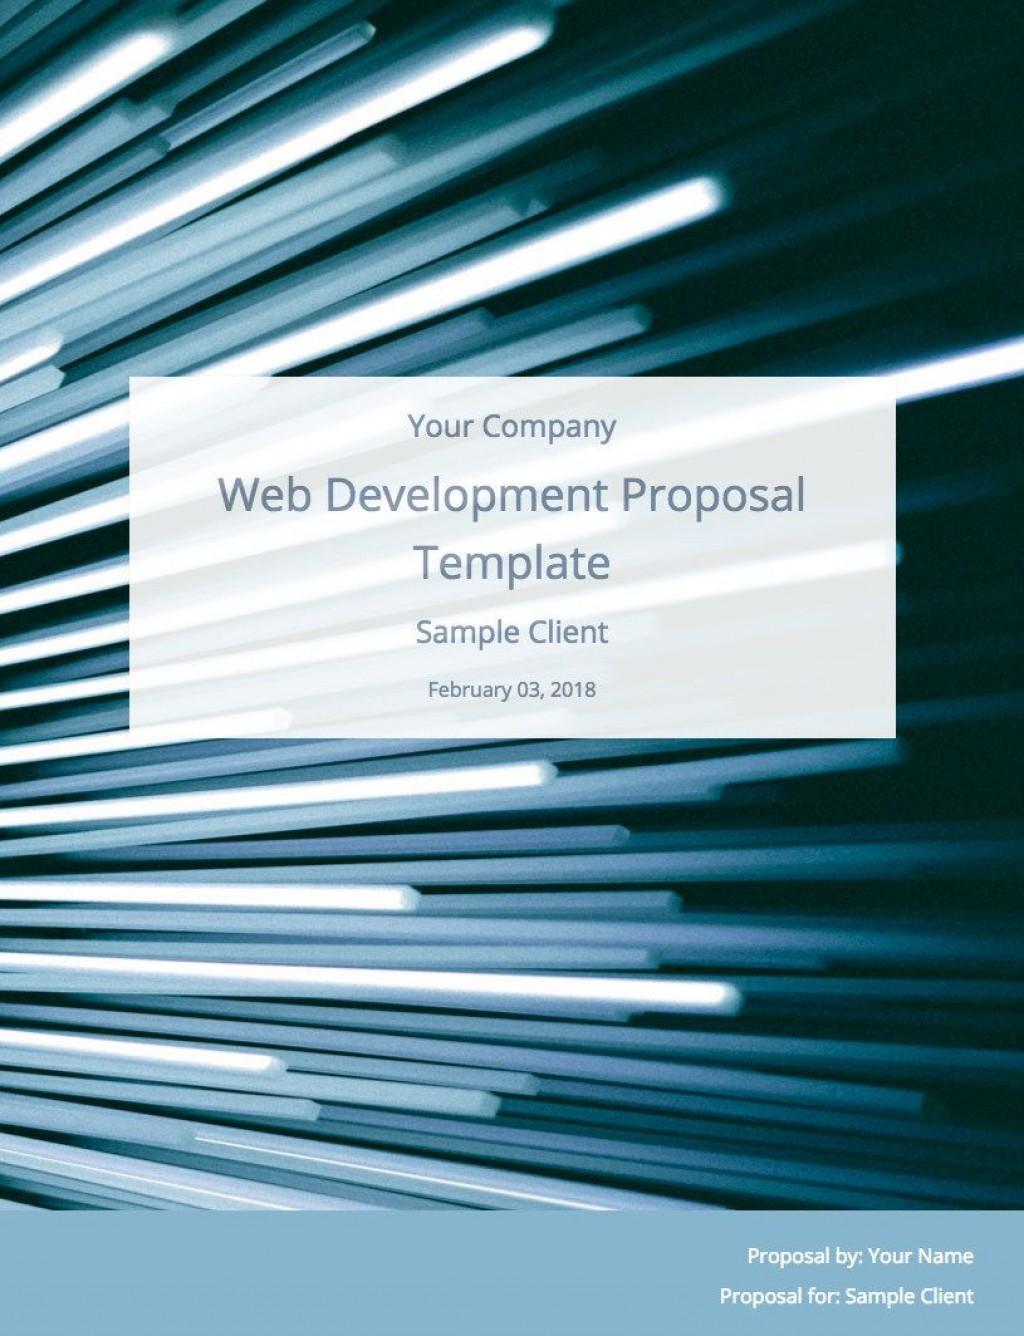 008 Unbelievable Website Development Proposal Format High Def  Web Template Pdf Sample EcommerceLarge